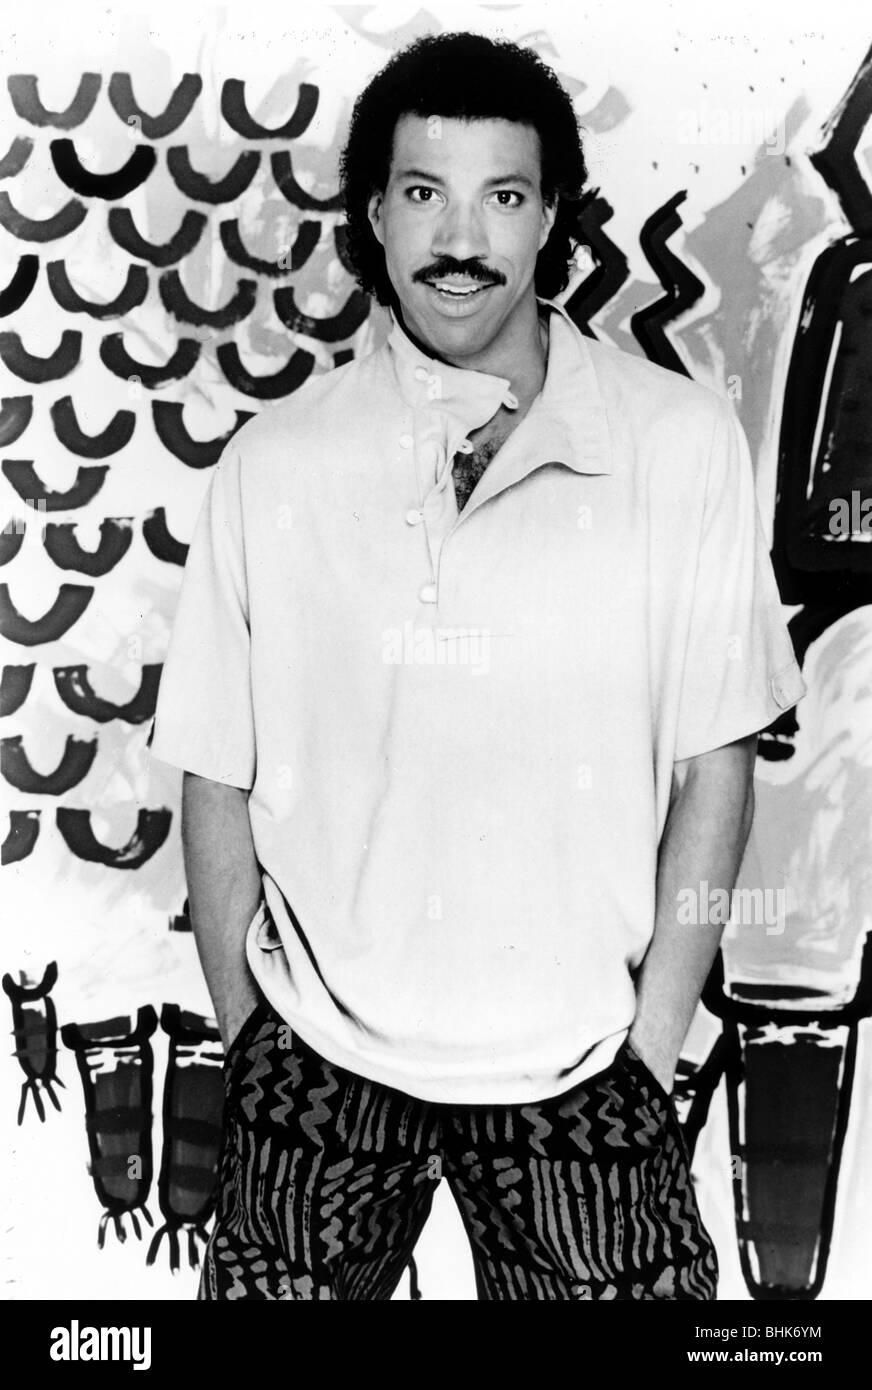 Lionel Richie (1949- ), American singer, 1988. - Stock Image